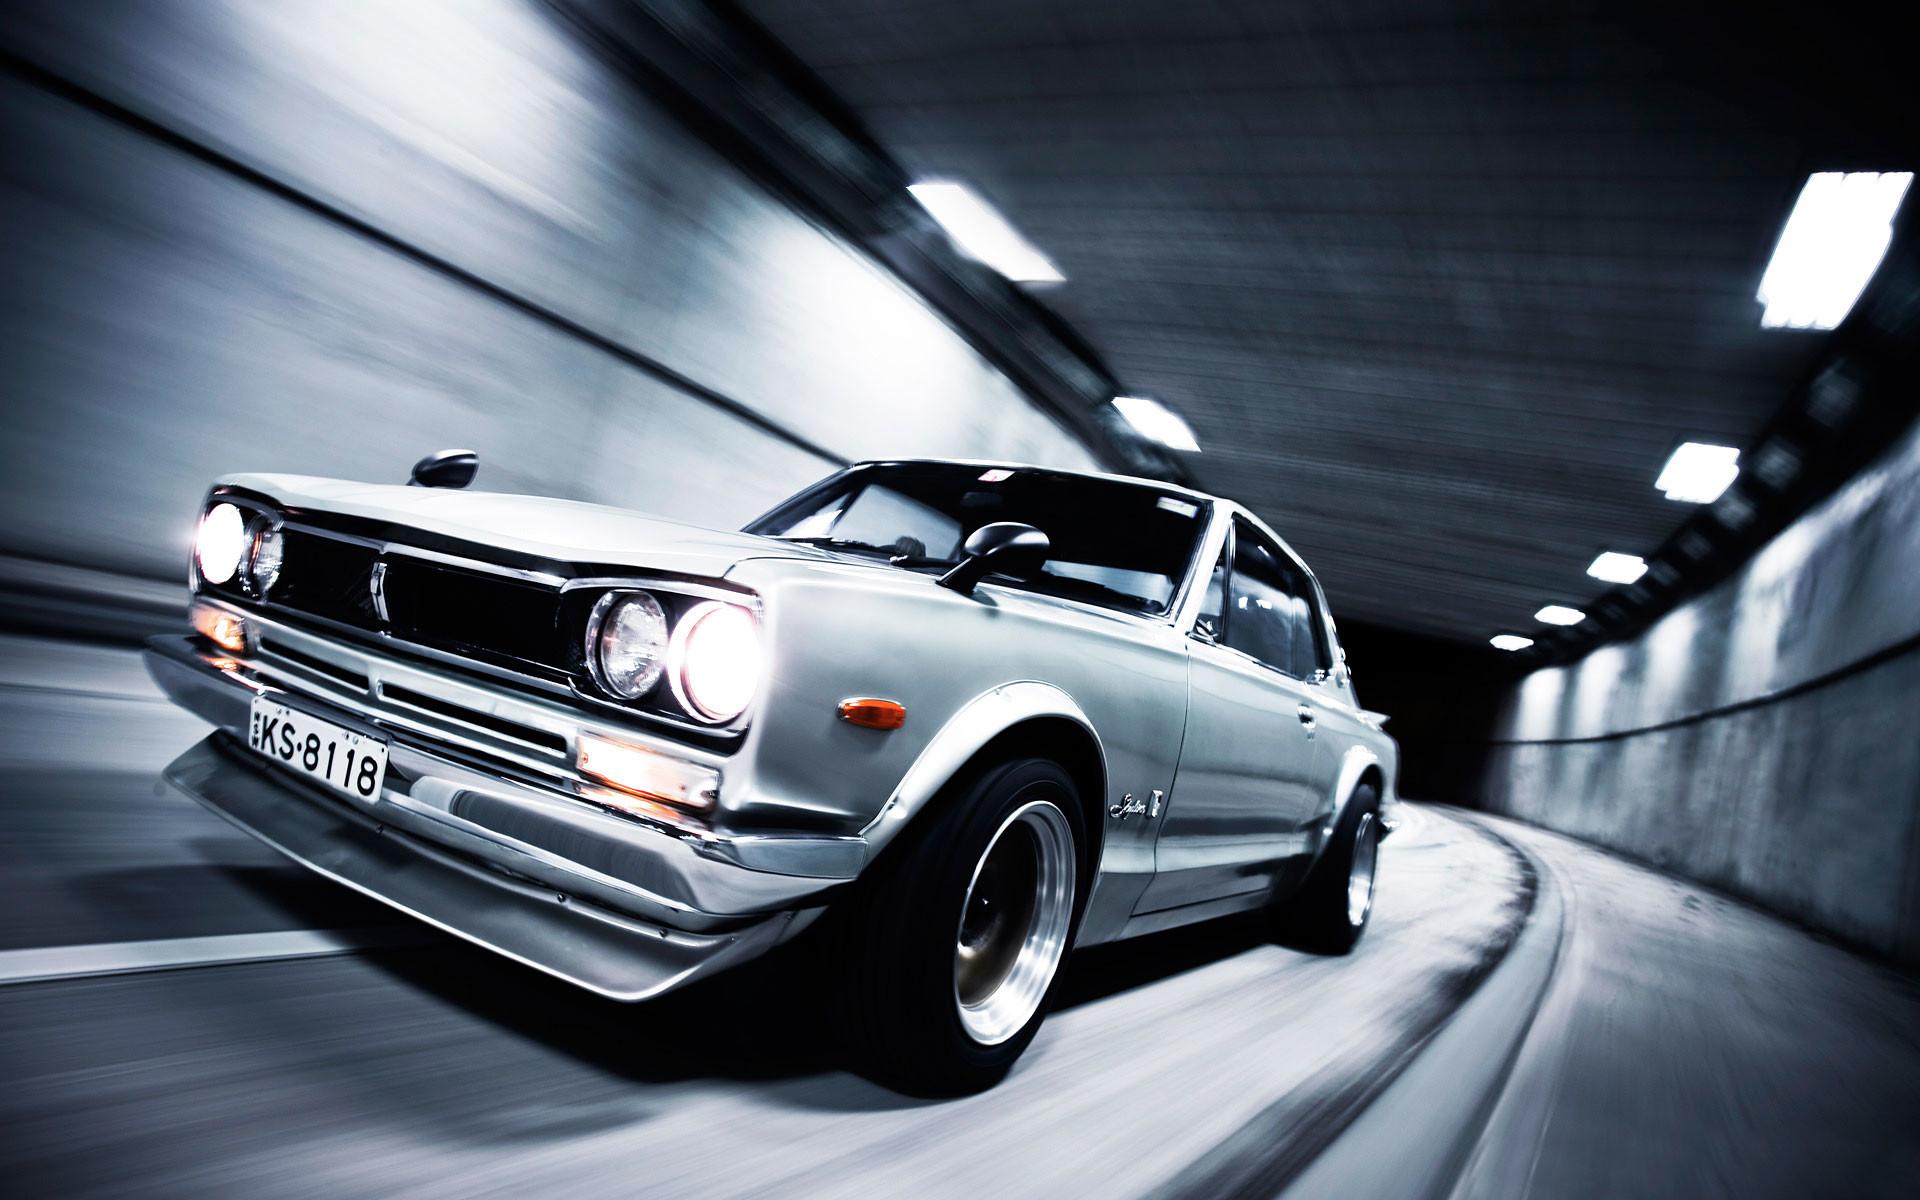 Res: 1920x1200, cars, tunnels, Nissan, vehicles, Nissan Skyline, side view, Nissan Skyline  GT-R - Free Wallpaper / WallpaperJam.com